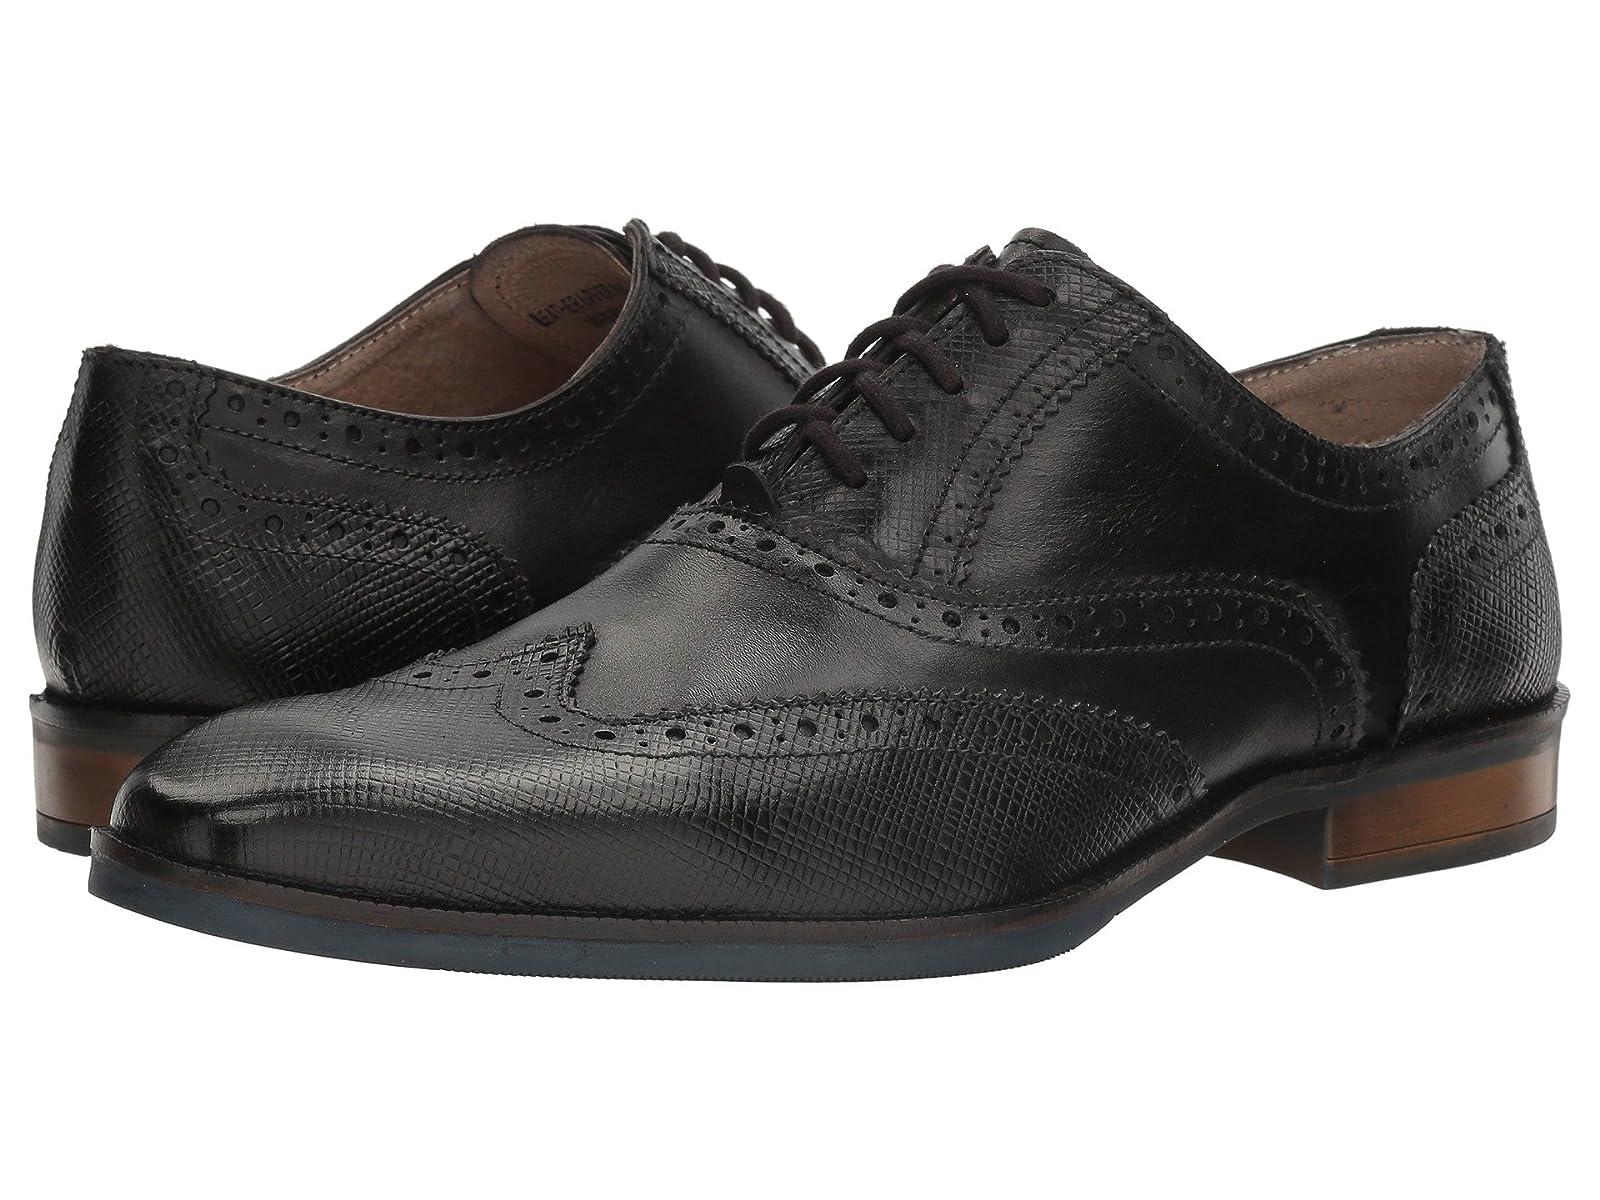 Giorgio Brutini RigbyCheap and distinctive eye-catching shoes